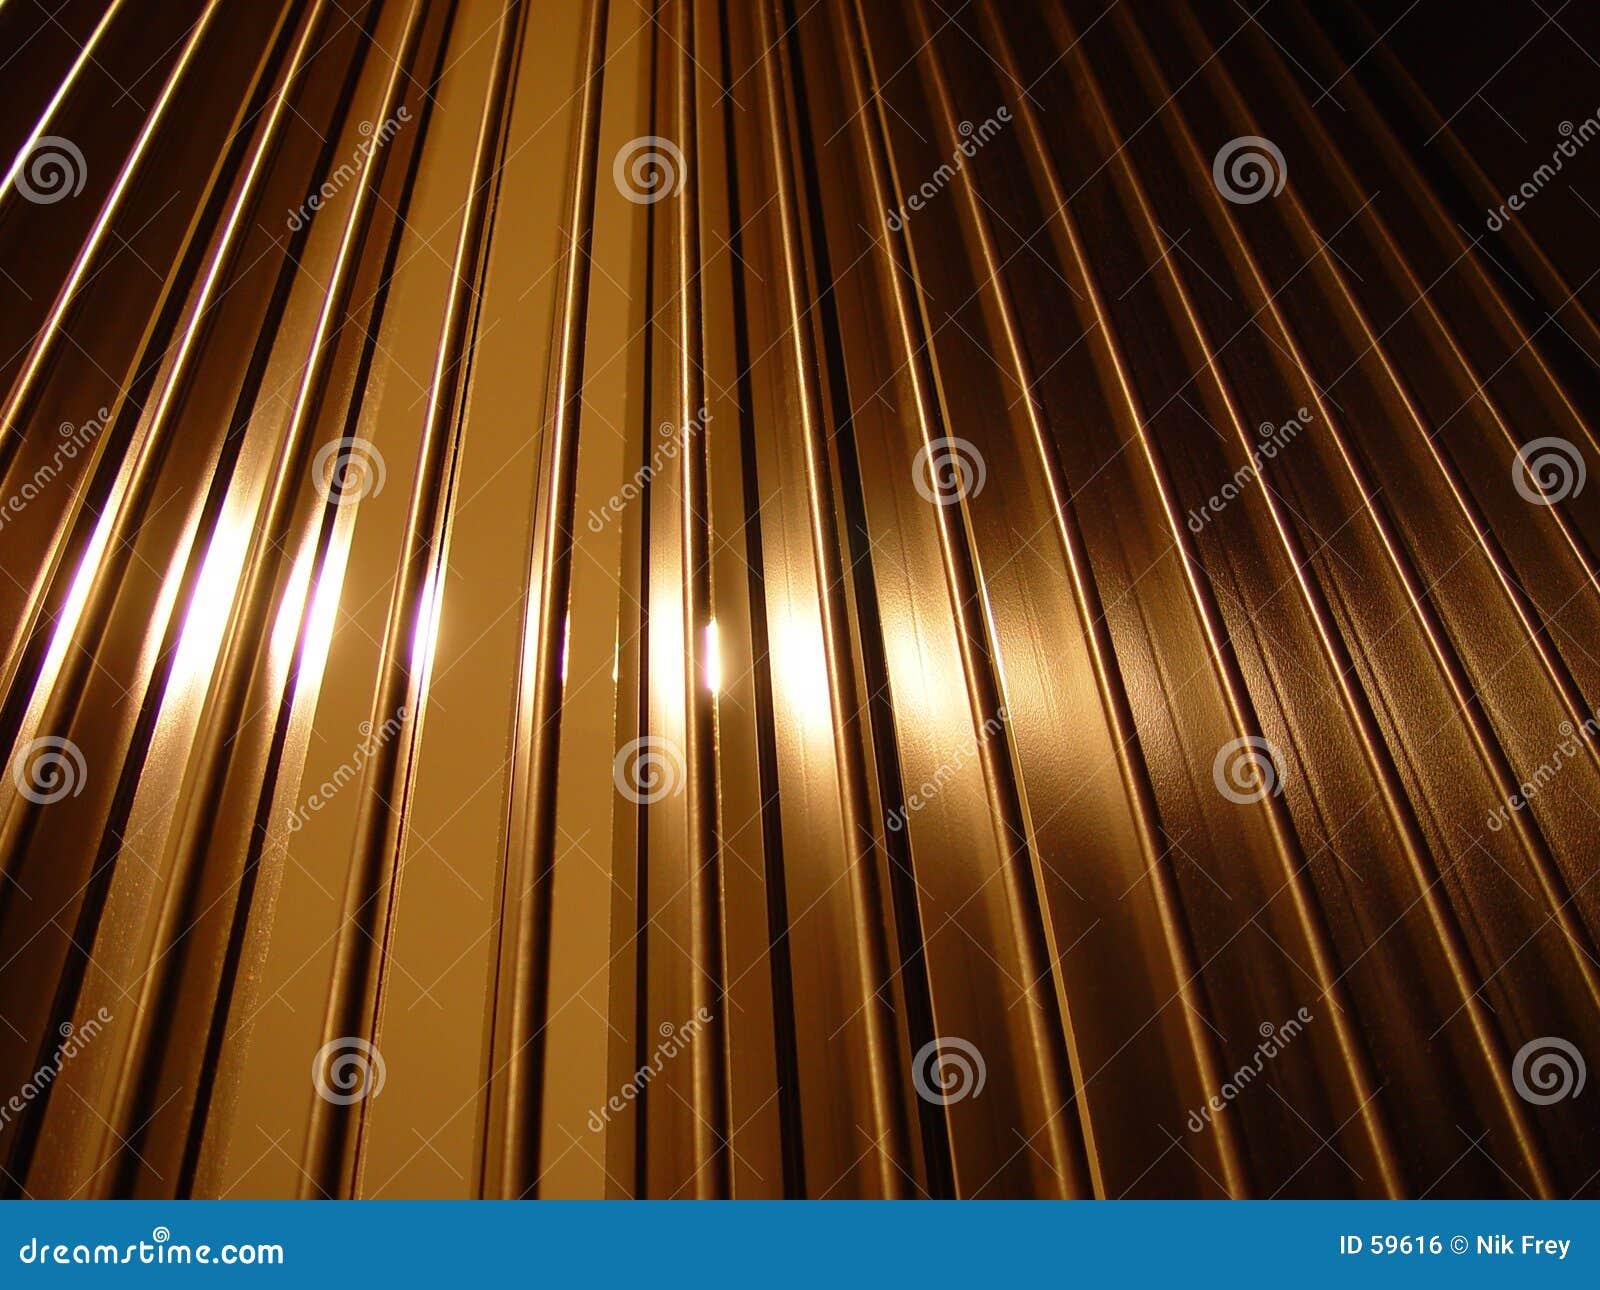 Barras de metal